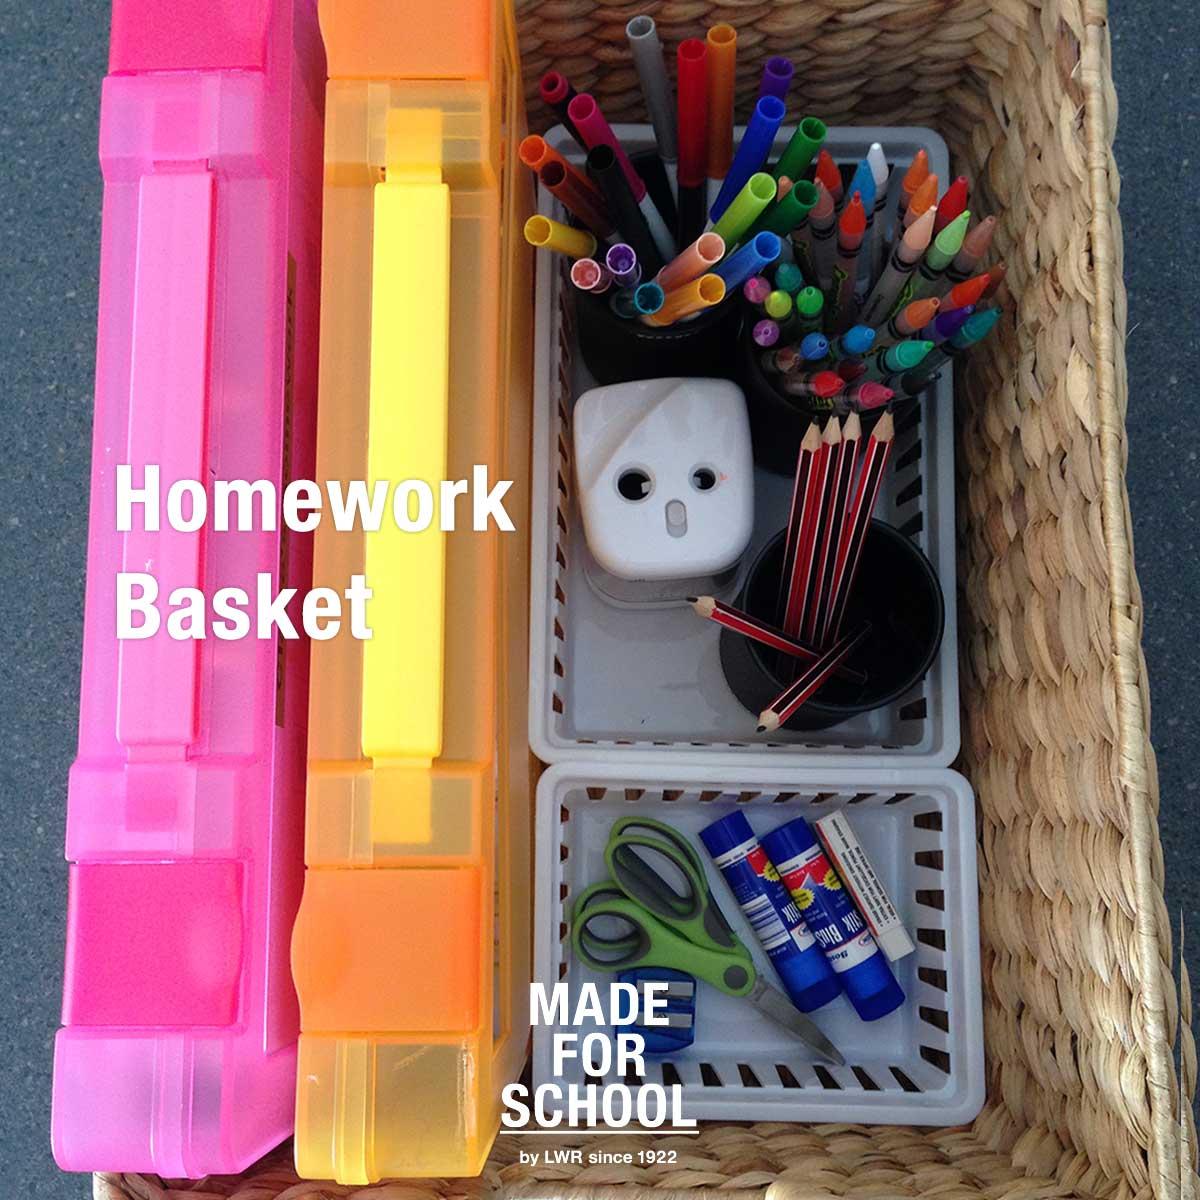 Homework Basket